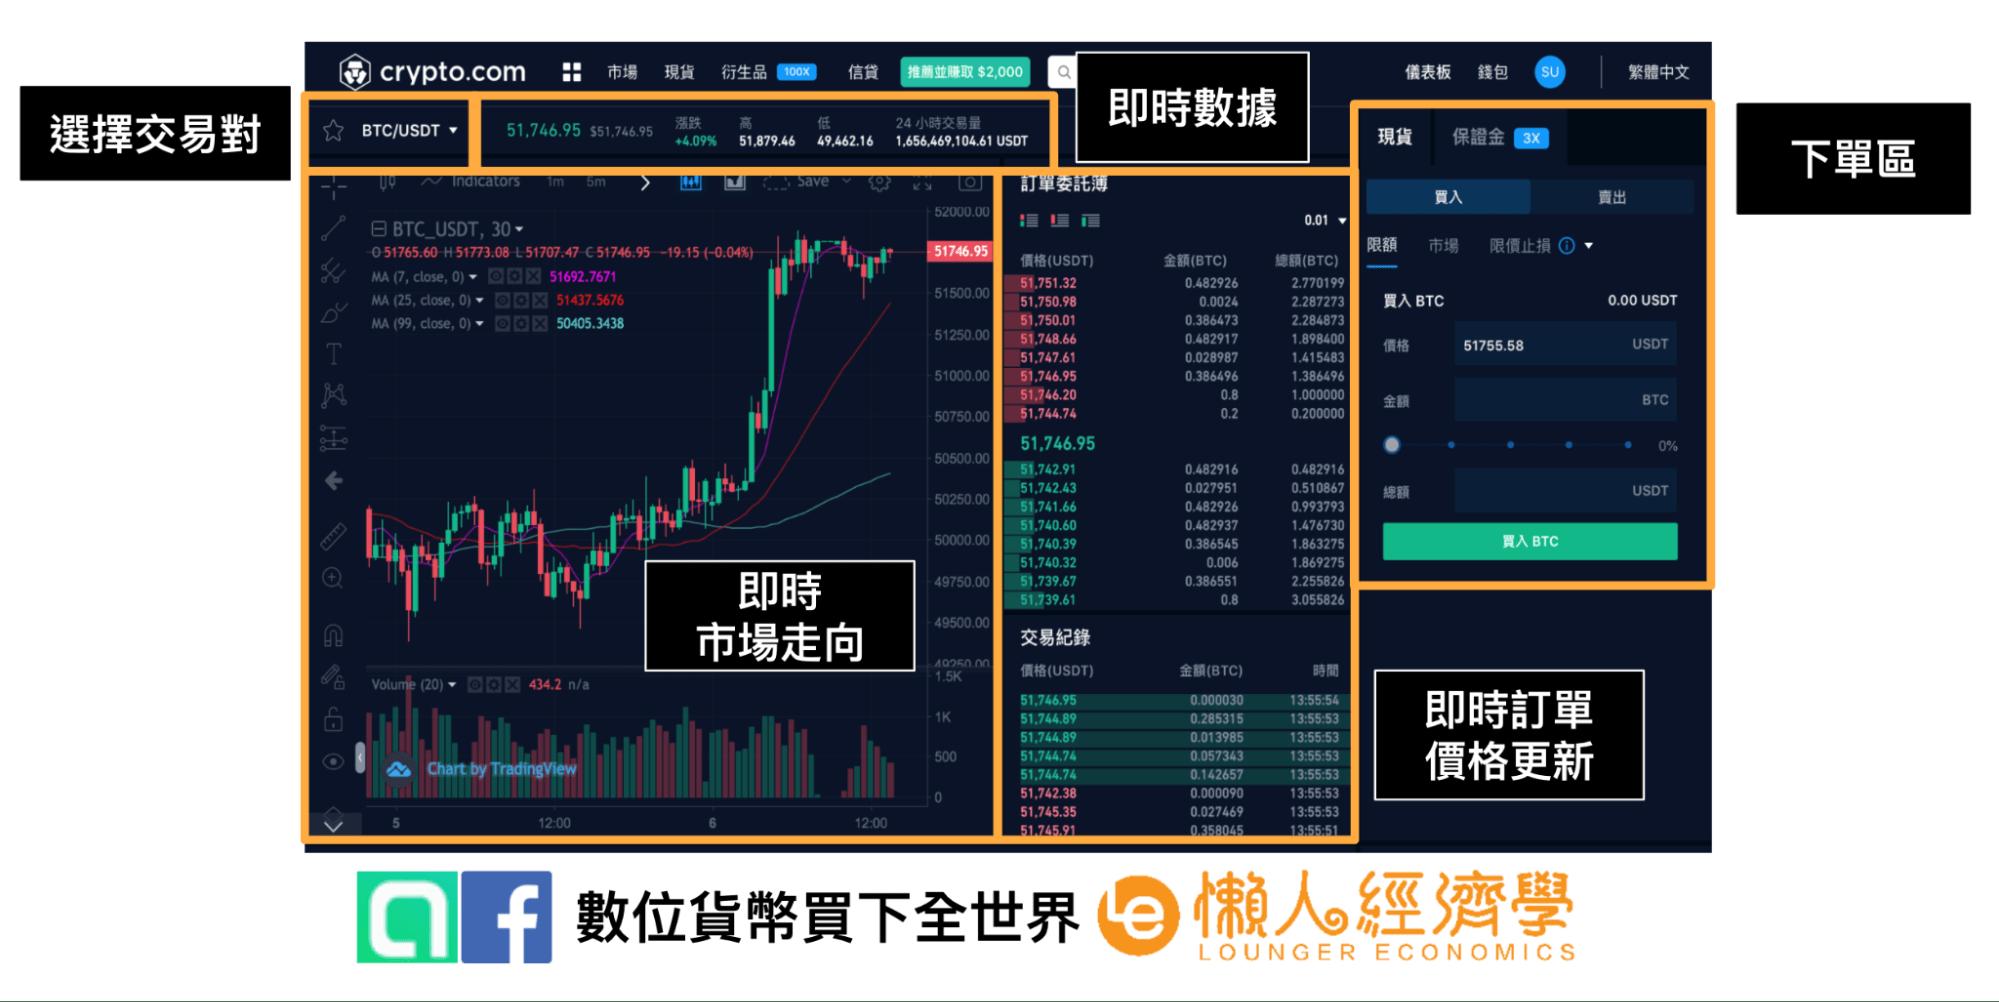 Crypto.com交易所頁面操作介紹2